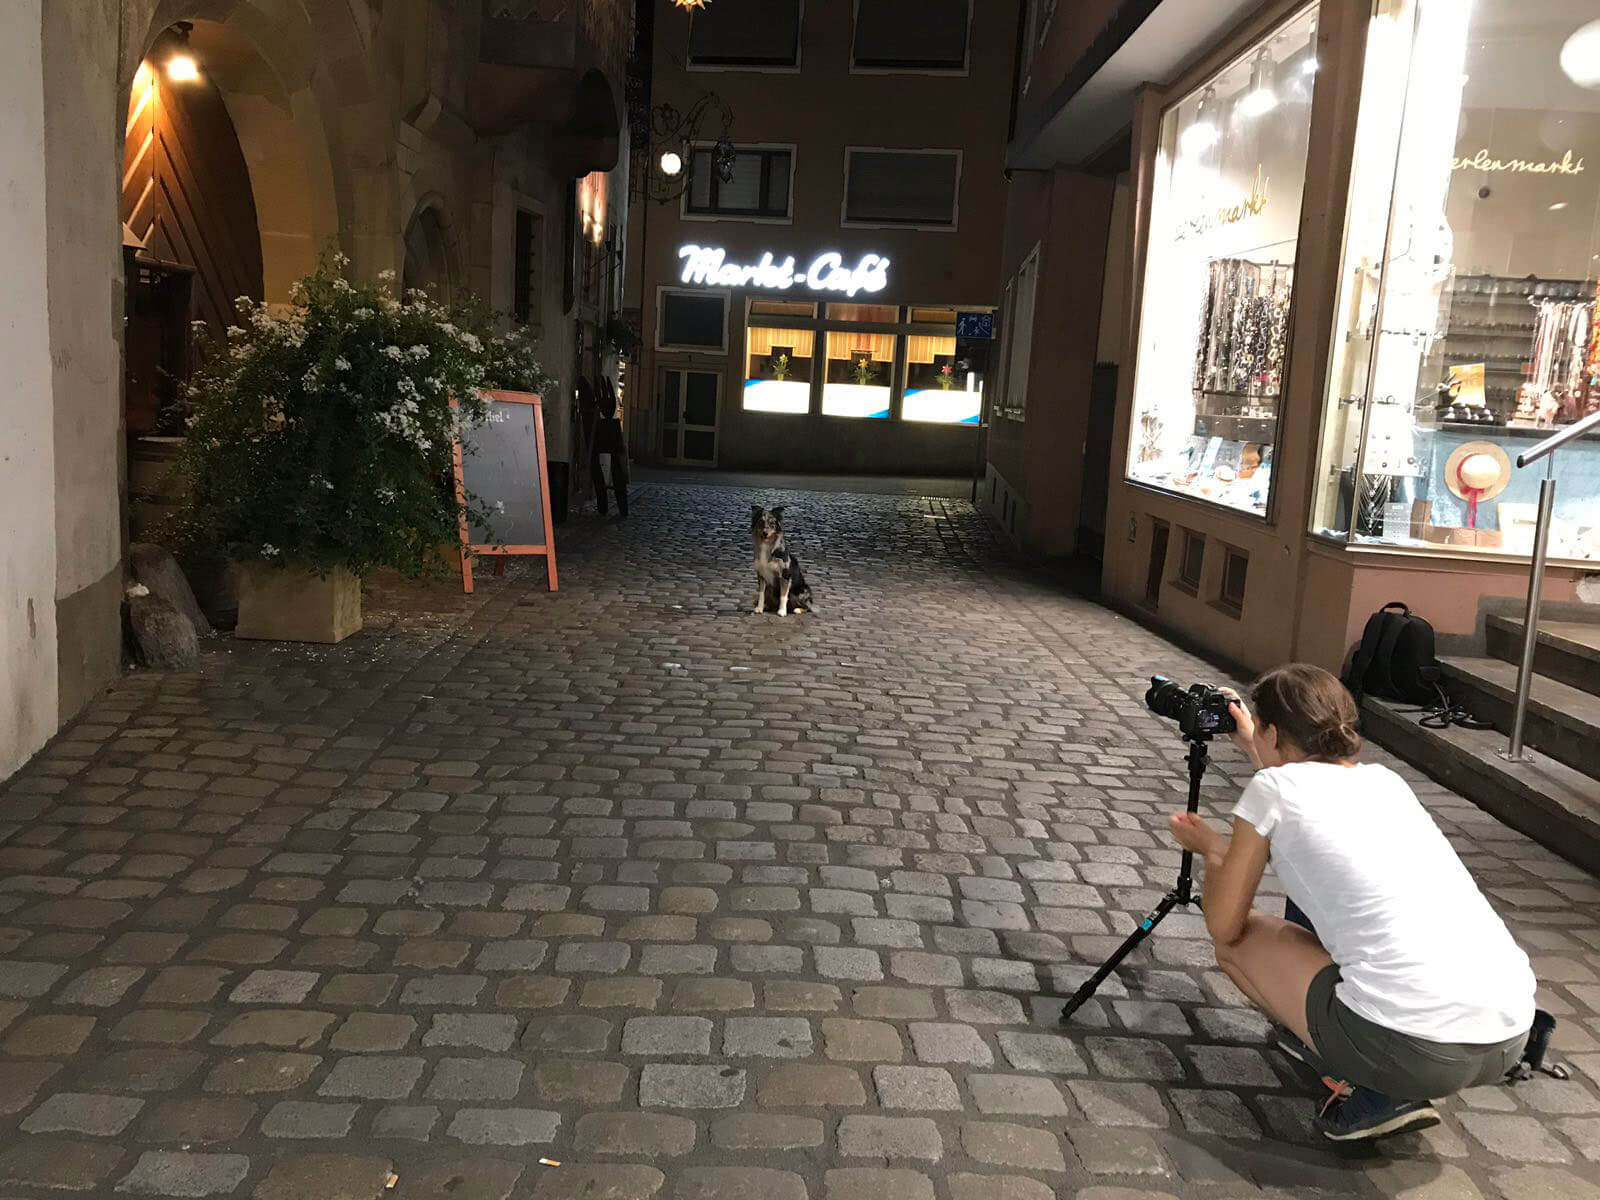 Tierfotografin | Würzburg Hunde Kalender | Yasemin Ikibas